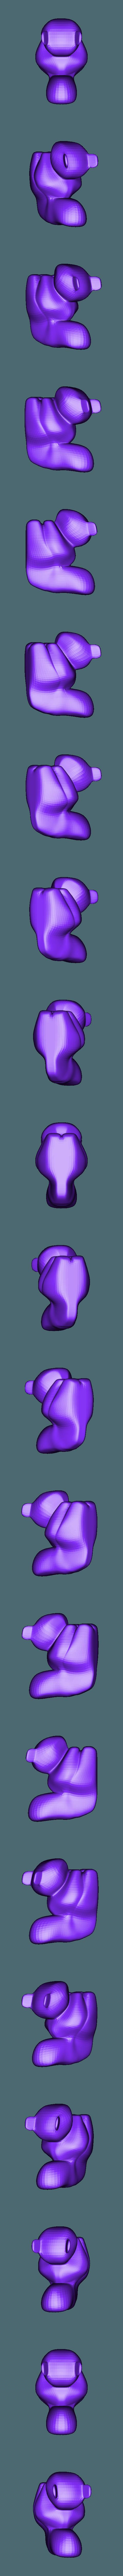 Squirrel.STL Download free STL file Squirrel • 3D print object, BQ_3D